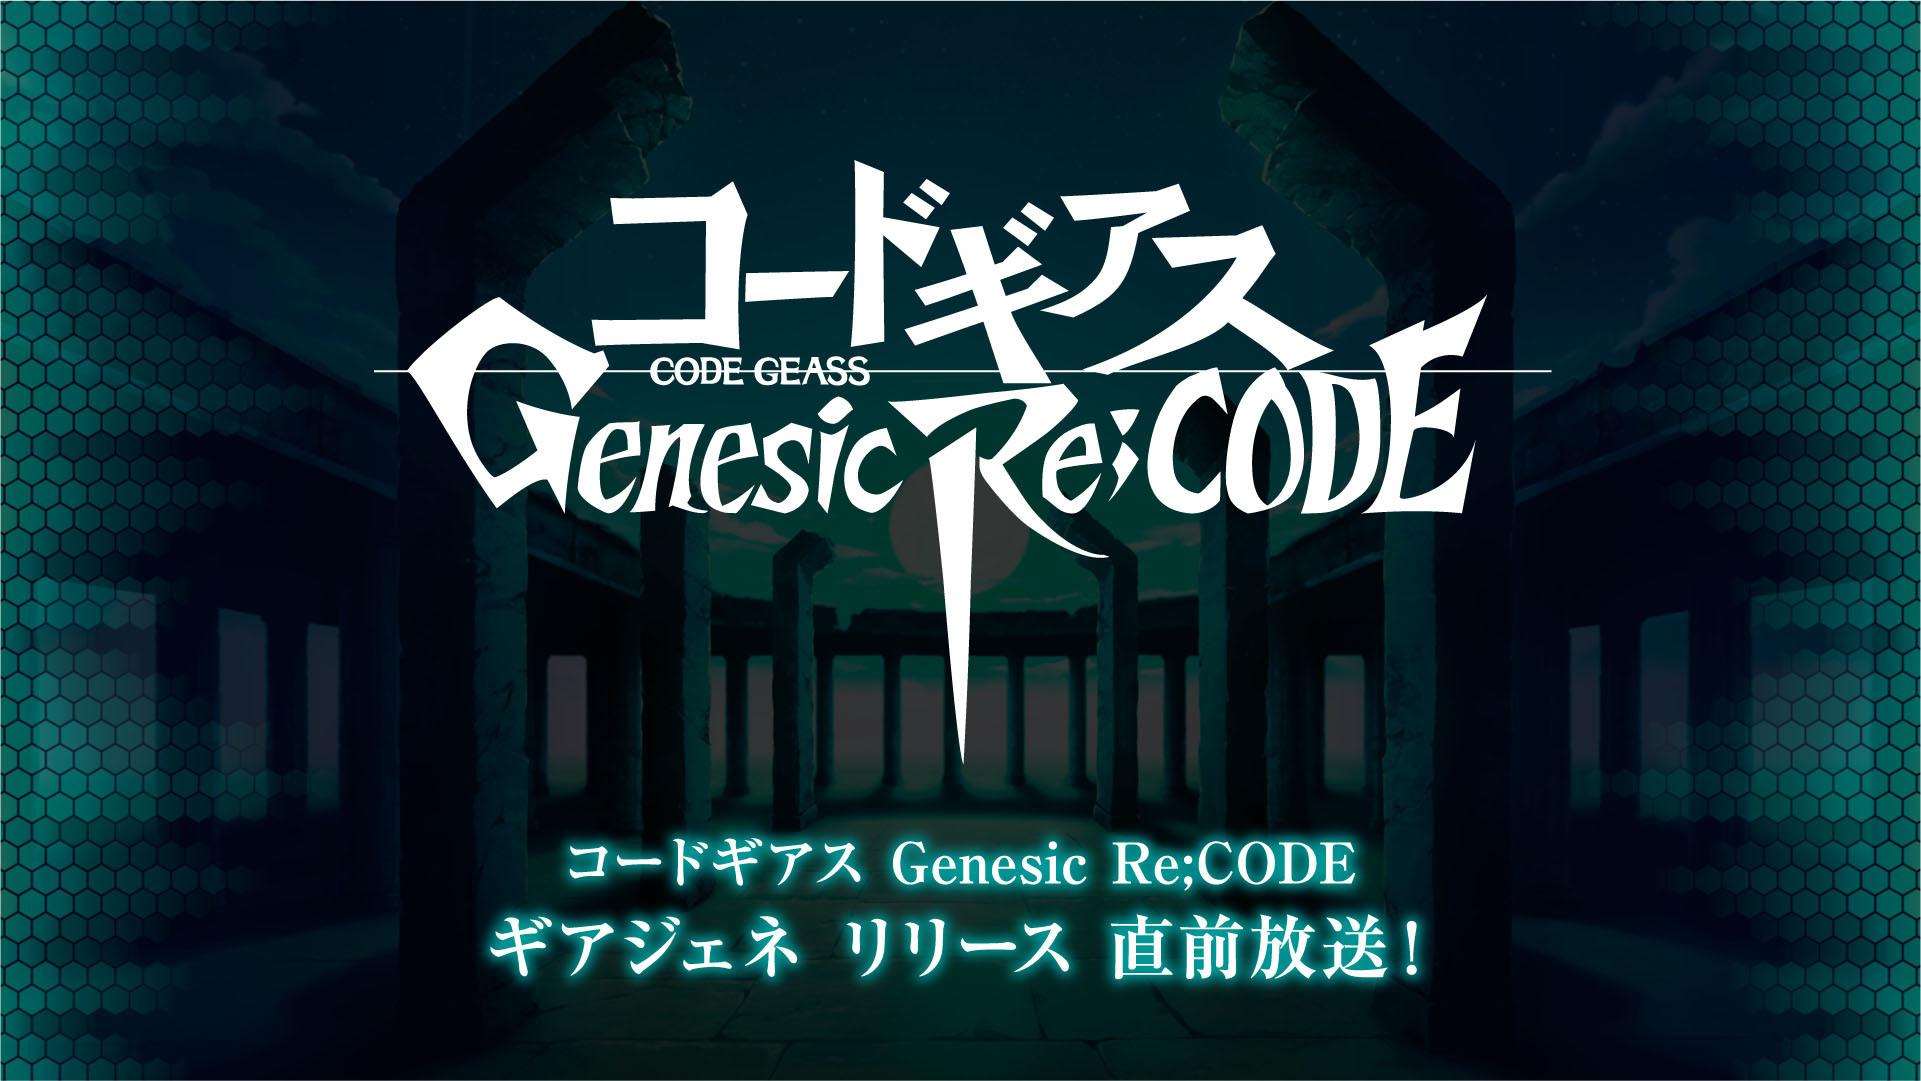 《Code Geass Genesic Re;CODE》公開遊戲限定劇情「血盟的紅羽」等新情報